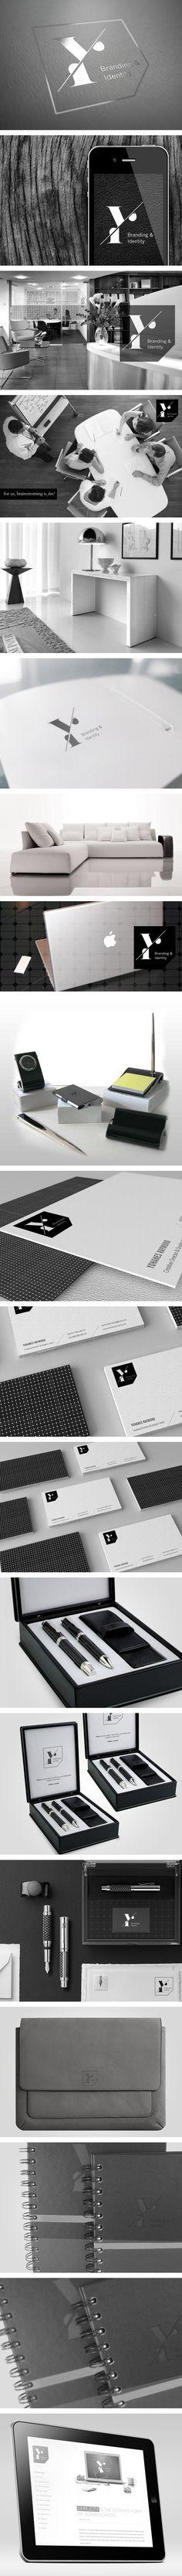 YR STUDIO Inc. by Yohanes Raymond | #stationary #corporate #design #corporatedesign